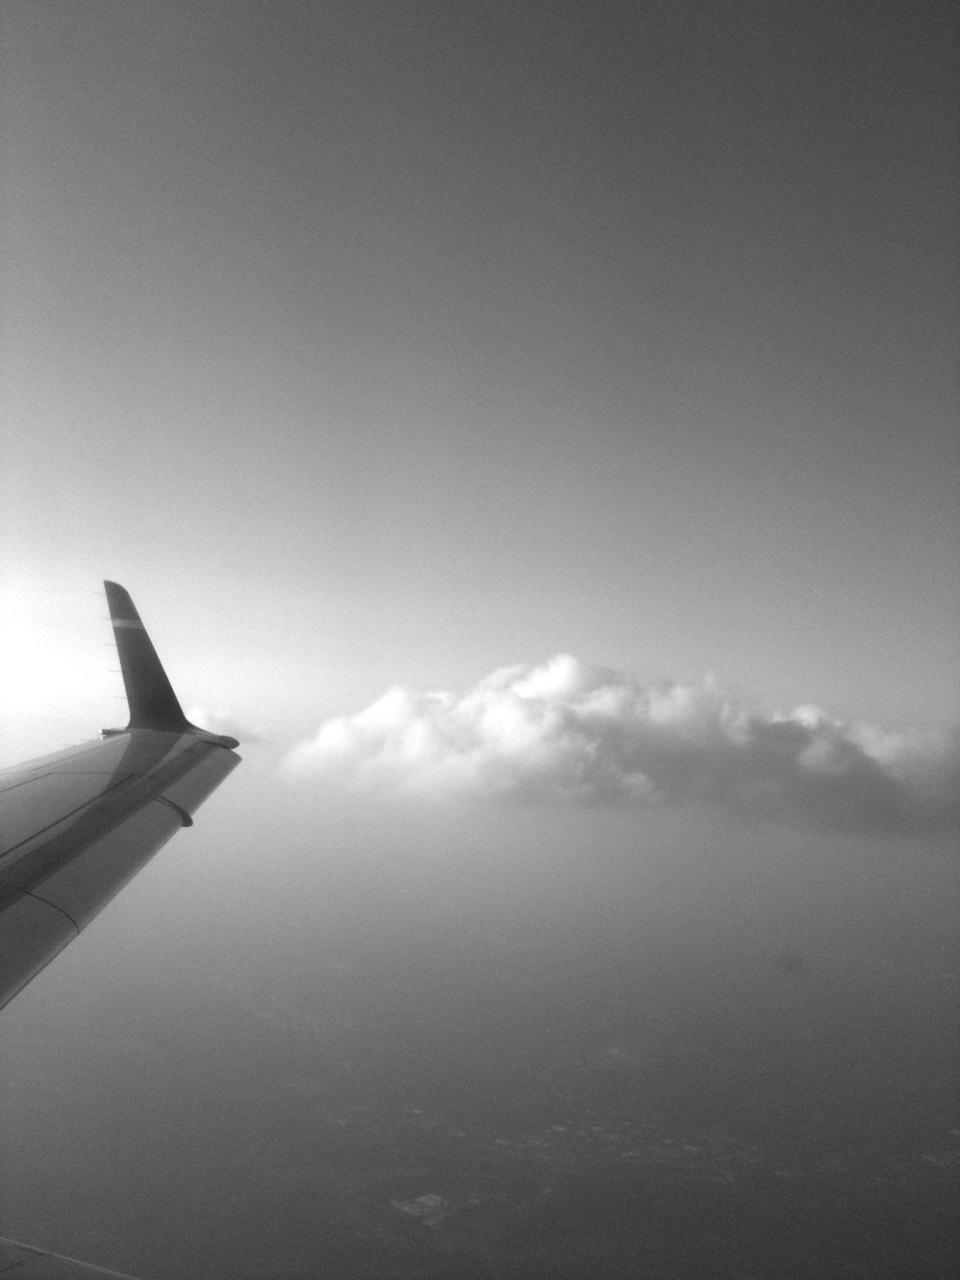 2010-09-01-wing.jpg